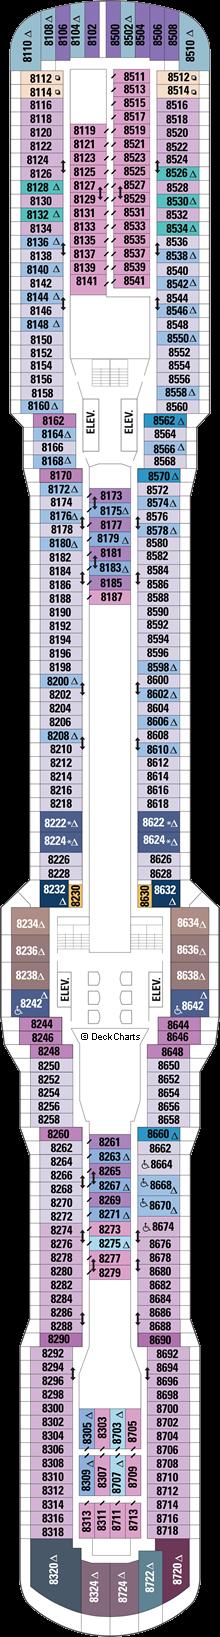 Ovation of the Seas: Deck 8